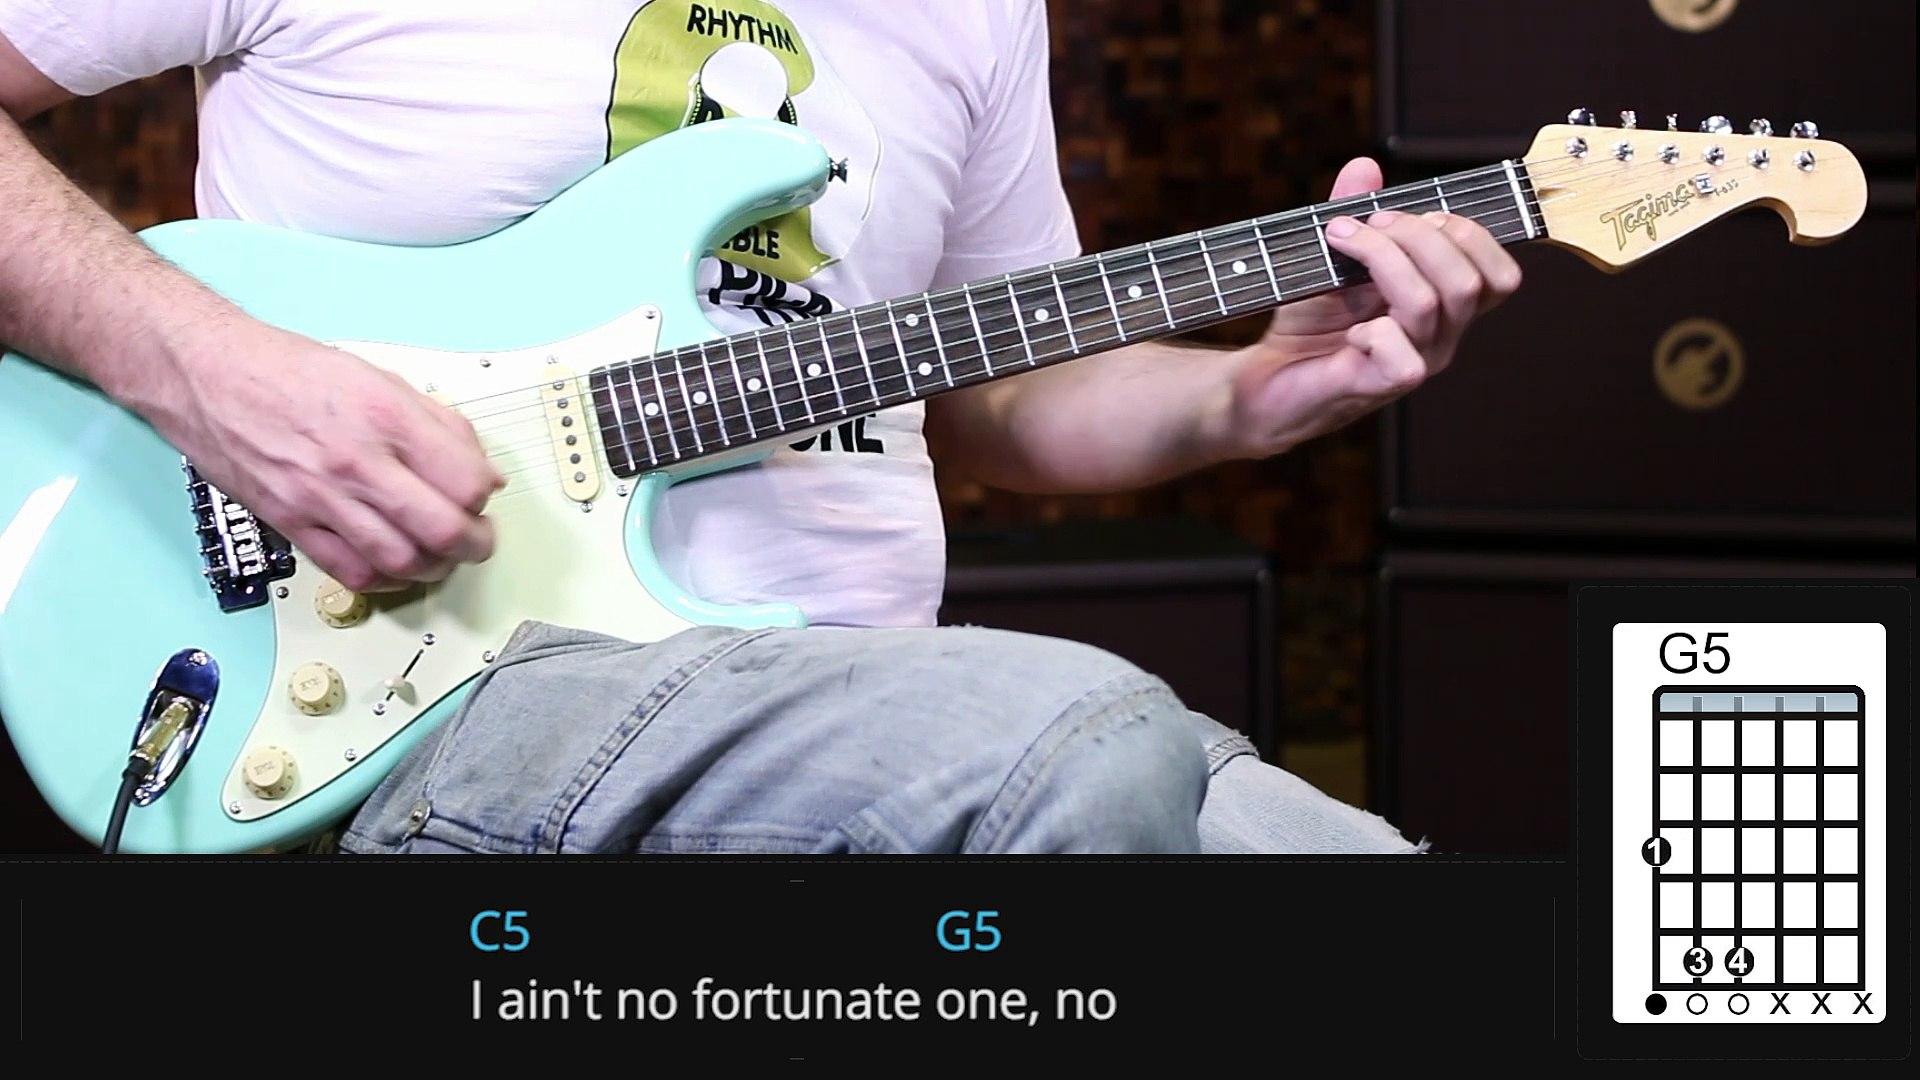 Creedence Clearwater Revival - Fortunate Son (como tocar - aula de guitarra )